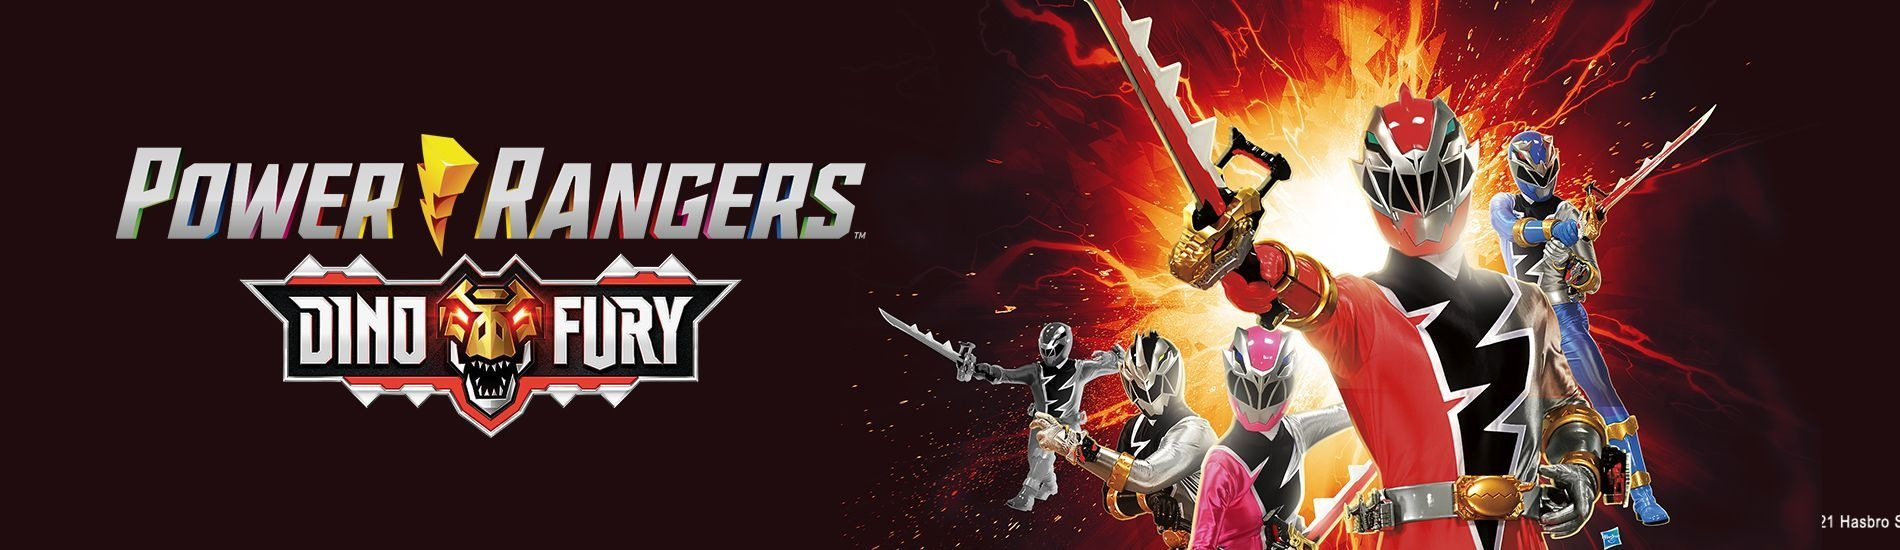 Power Rangers - Dino Fury en streaming sur Gulli Replay